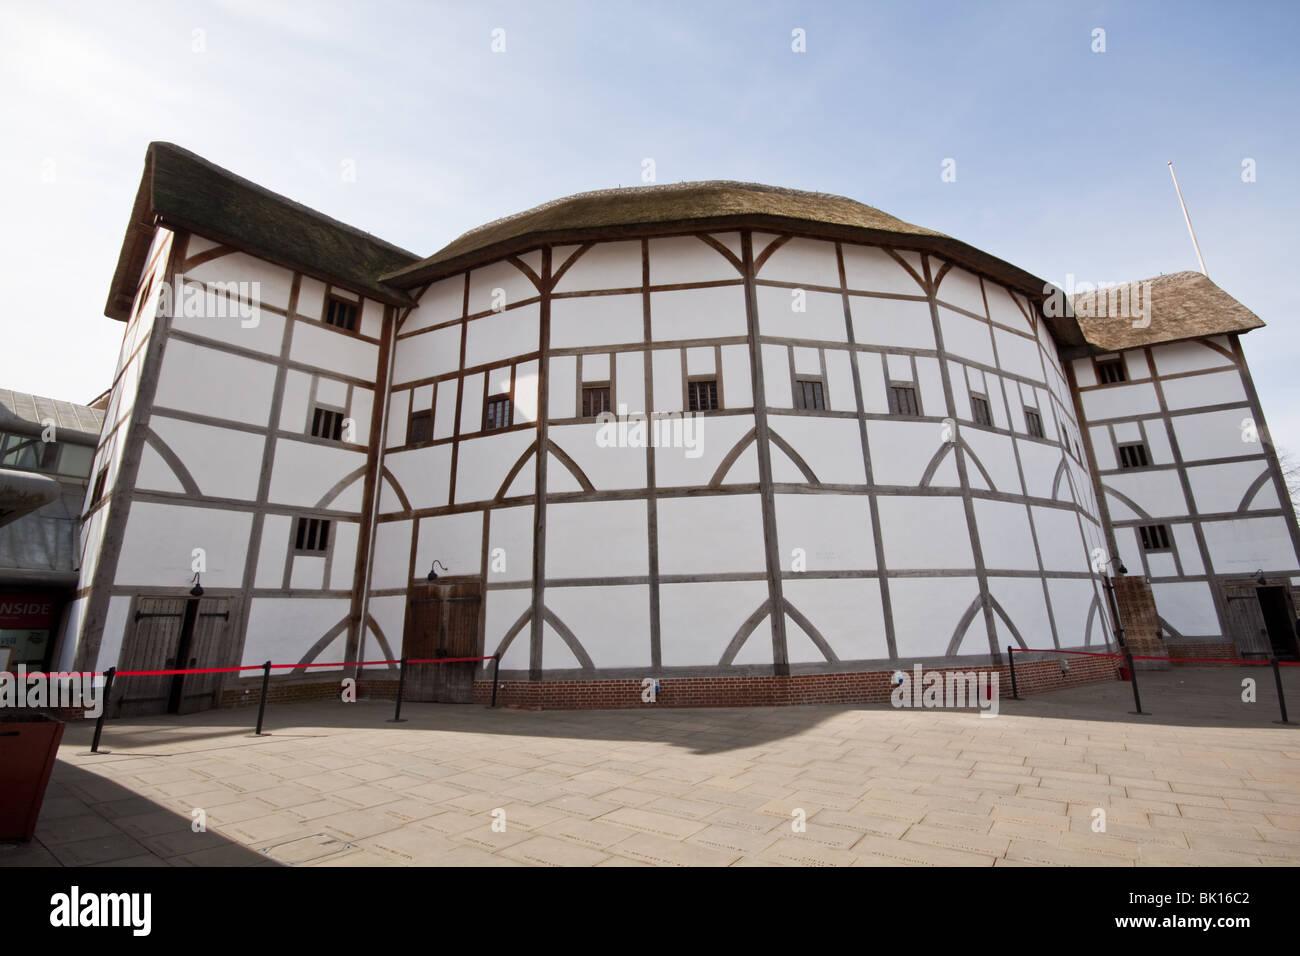 Shakespeare's Globe Theatre London - Stock Image